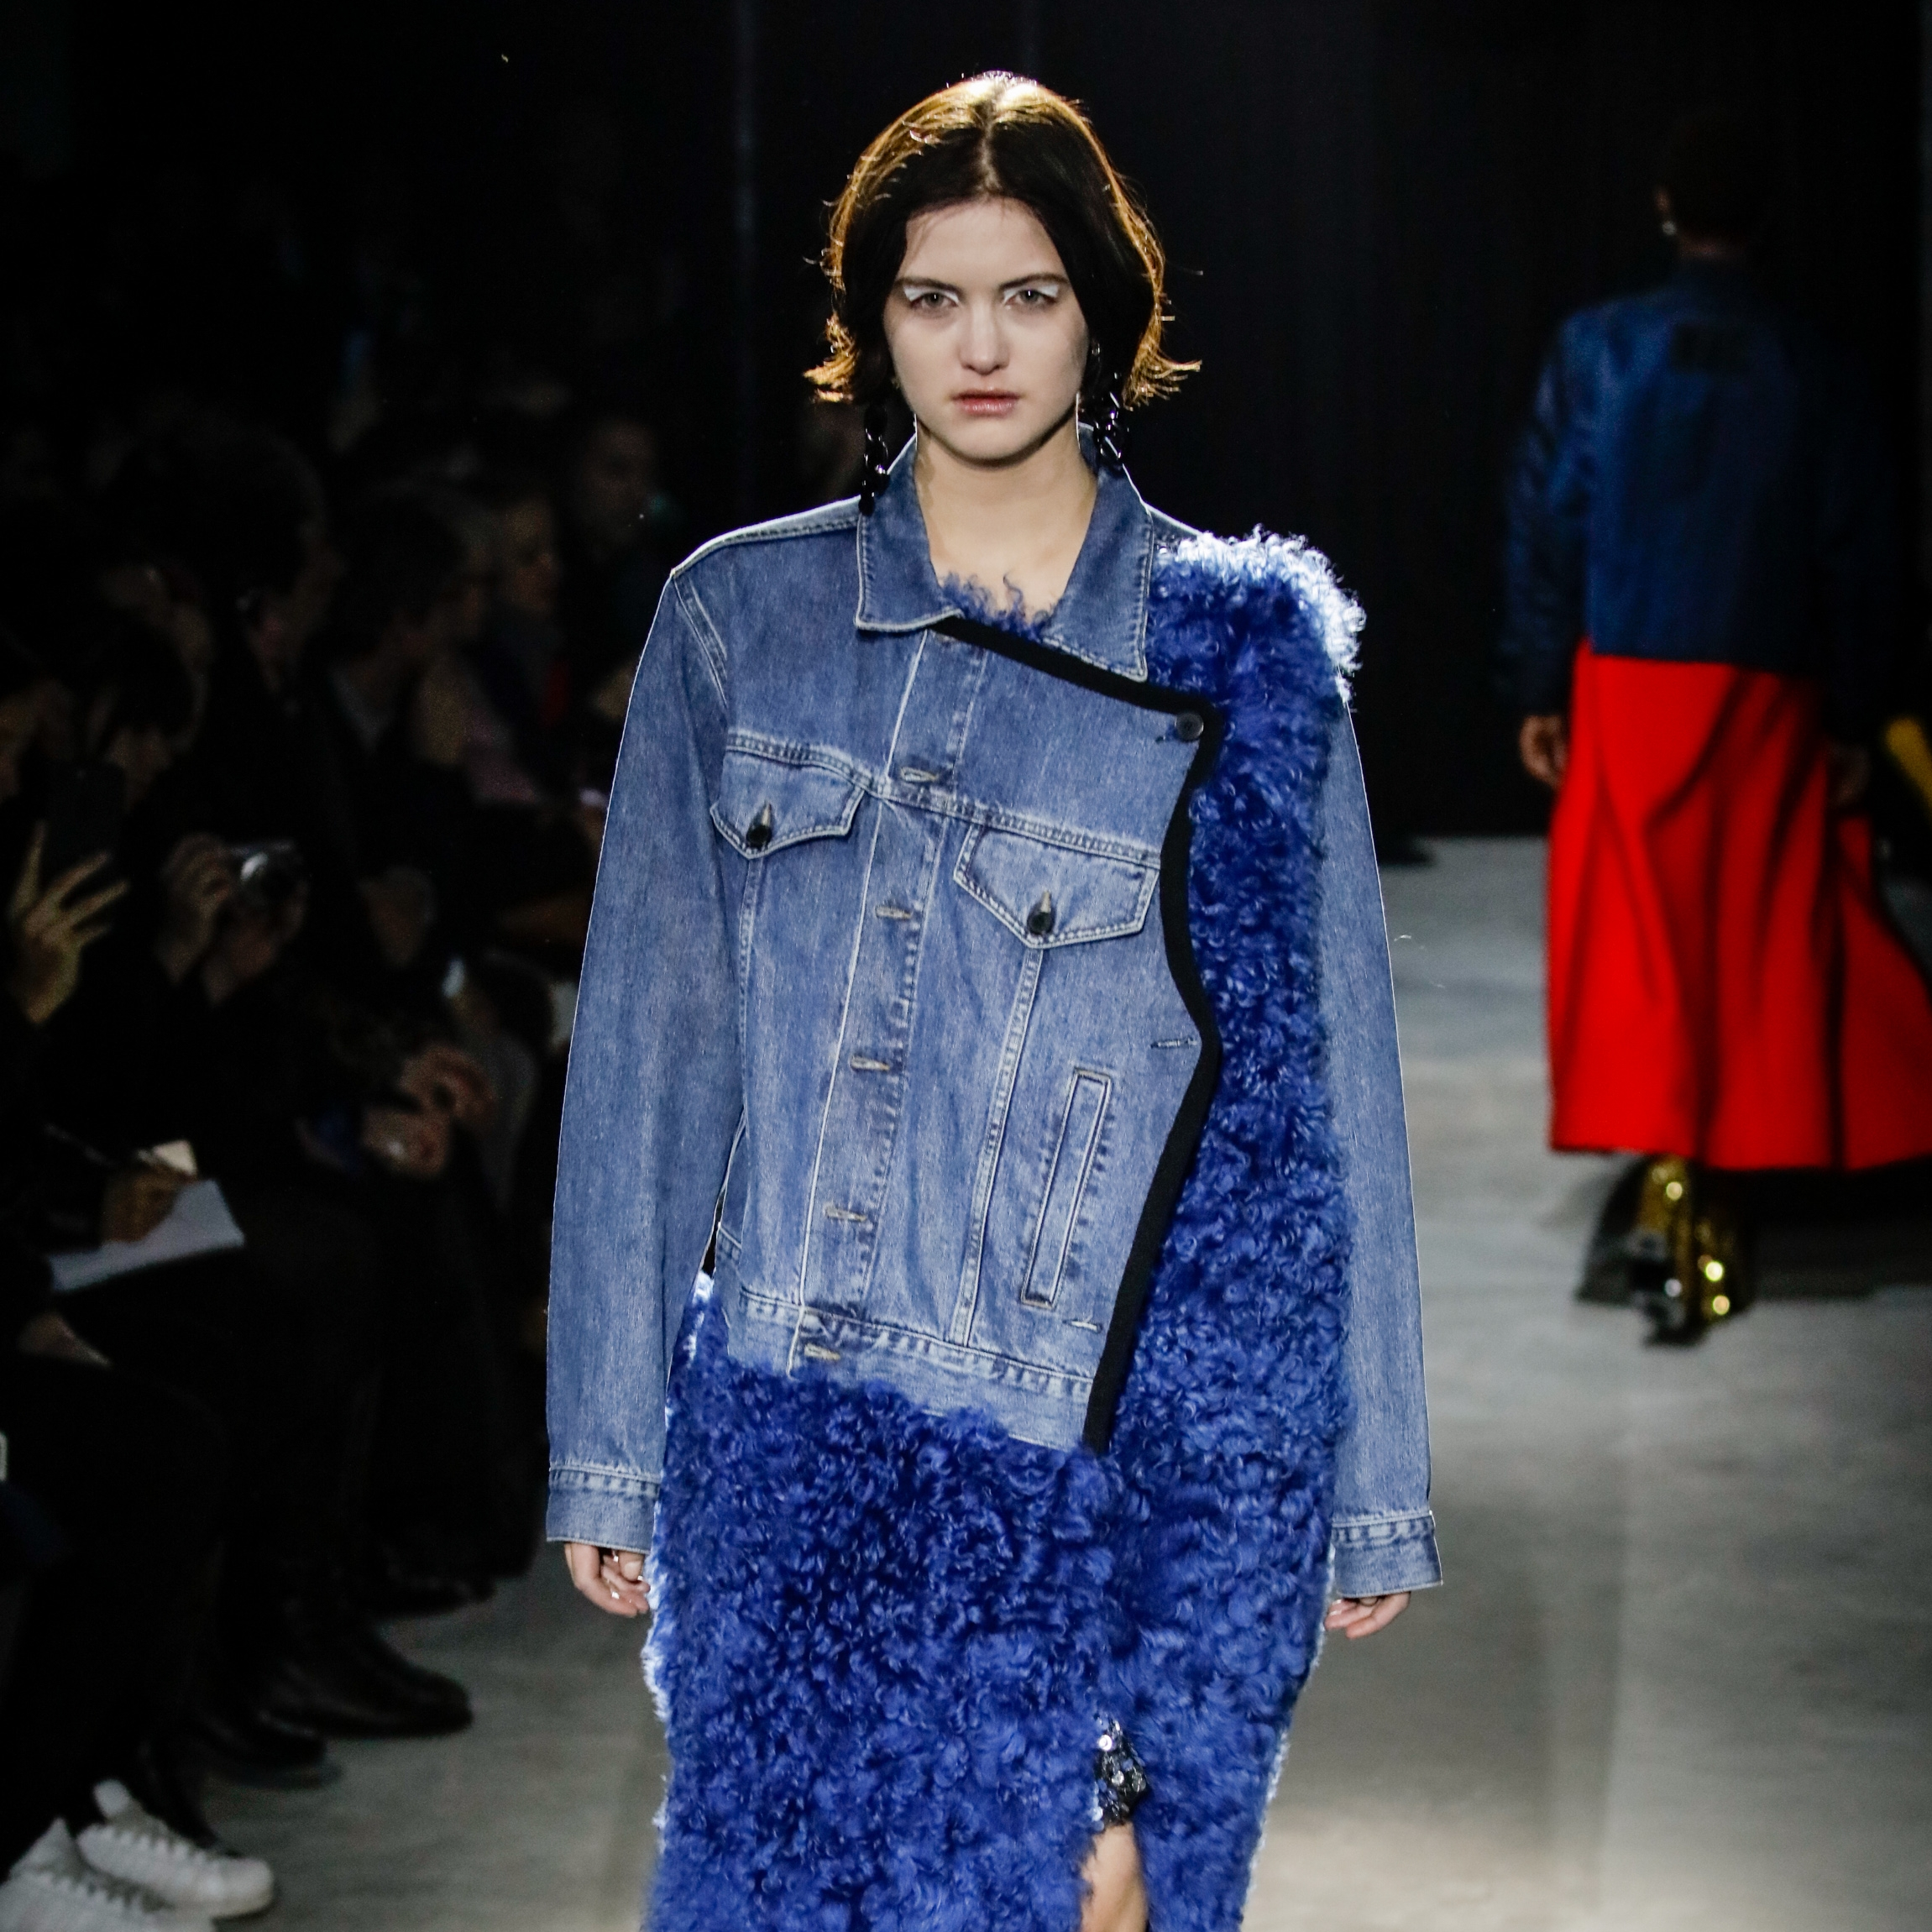 Lutz-Huelle Ready to Wear Autumn/Winter'17